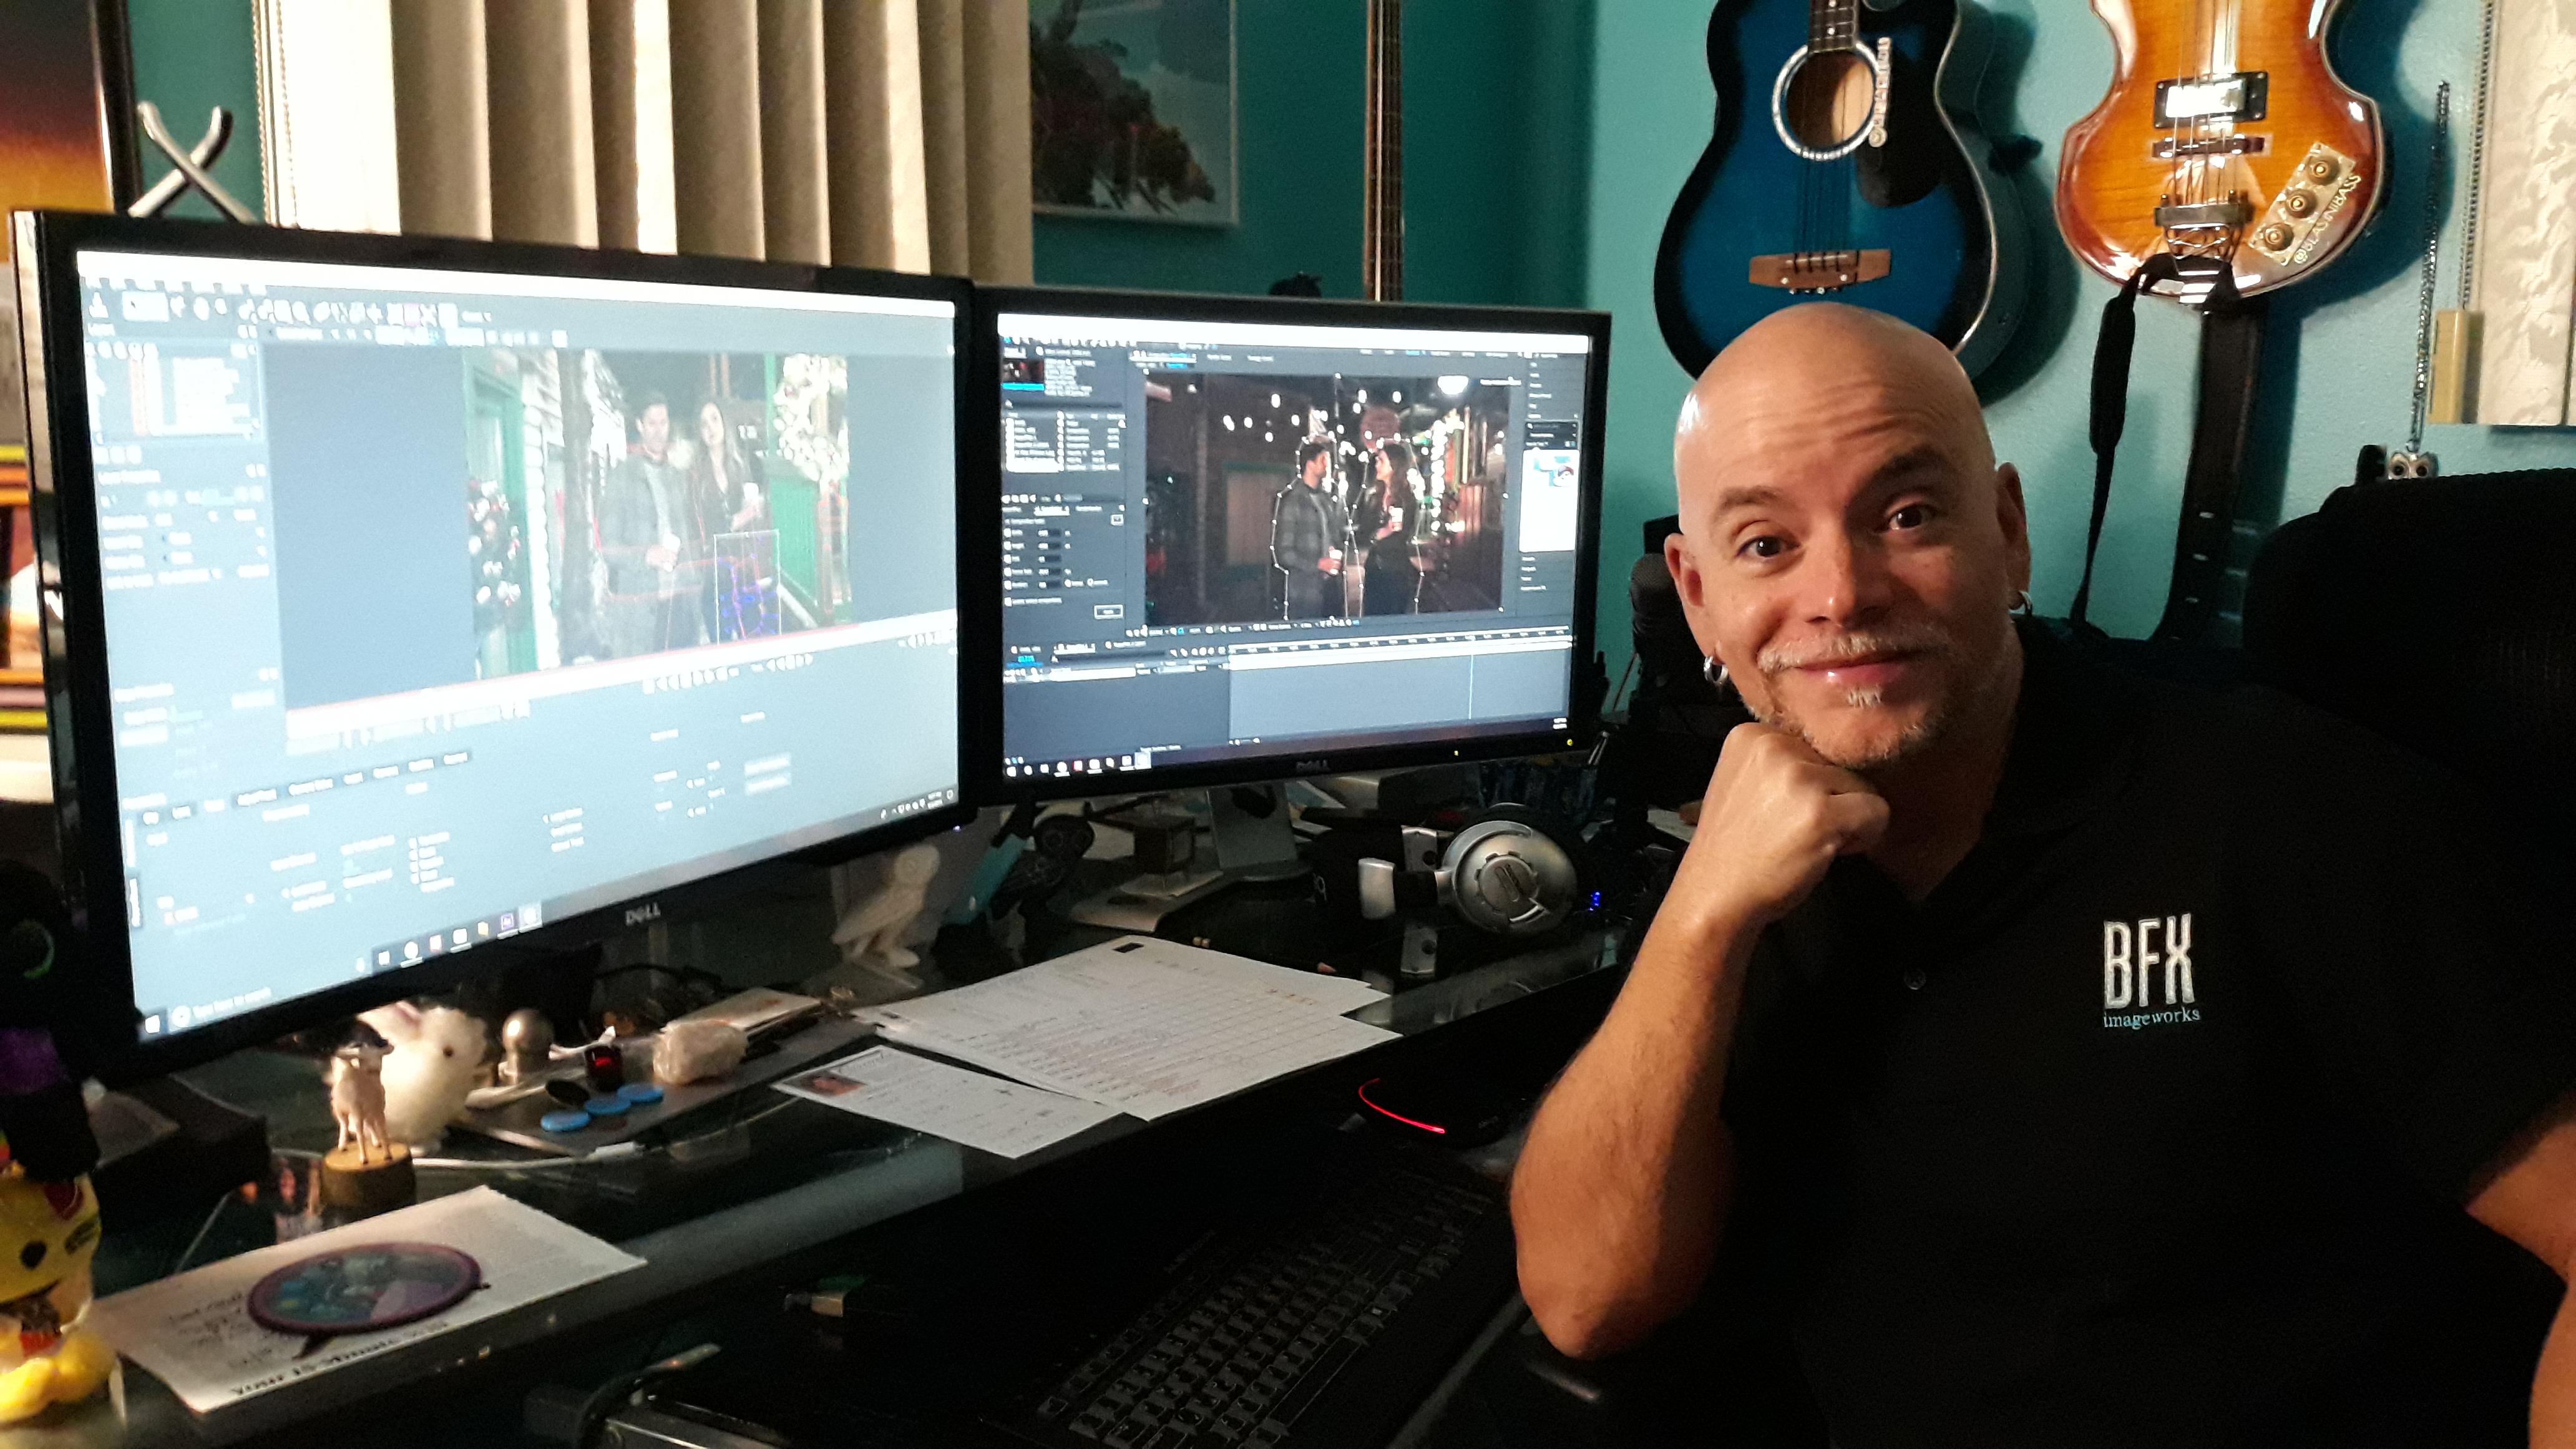 Blasini at his workstation